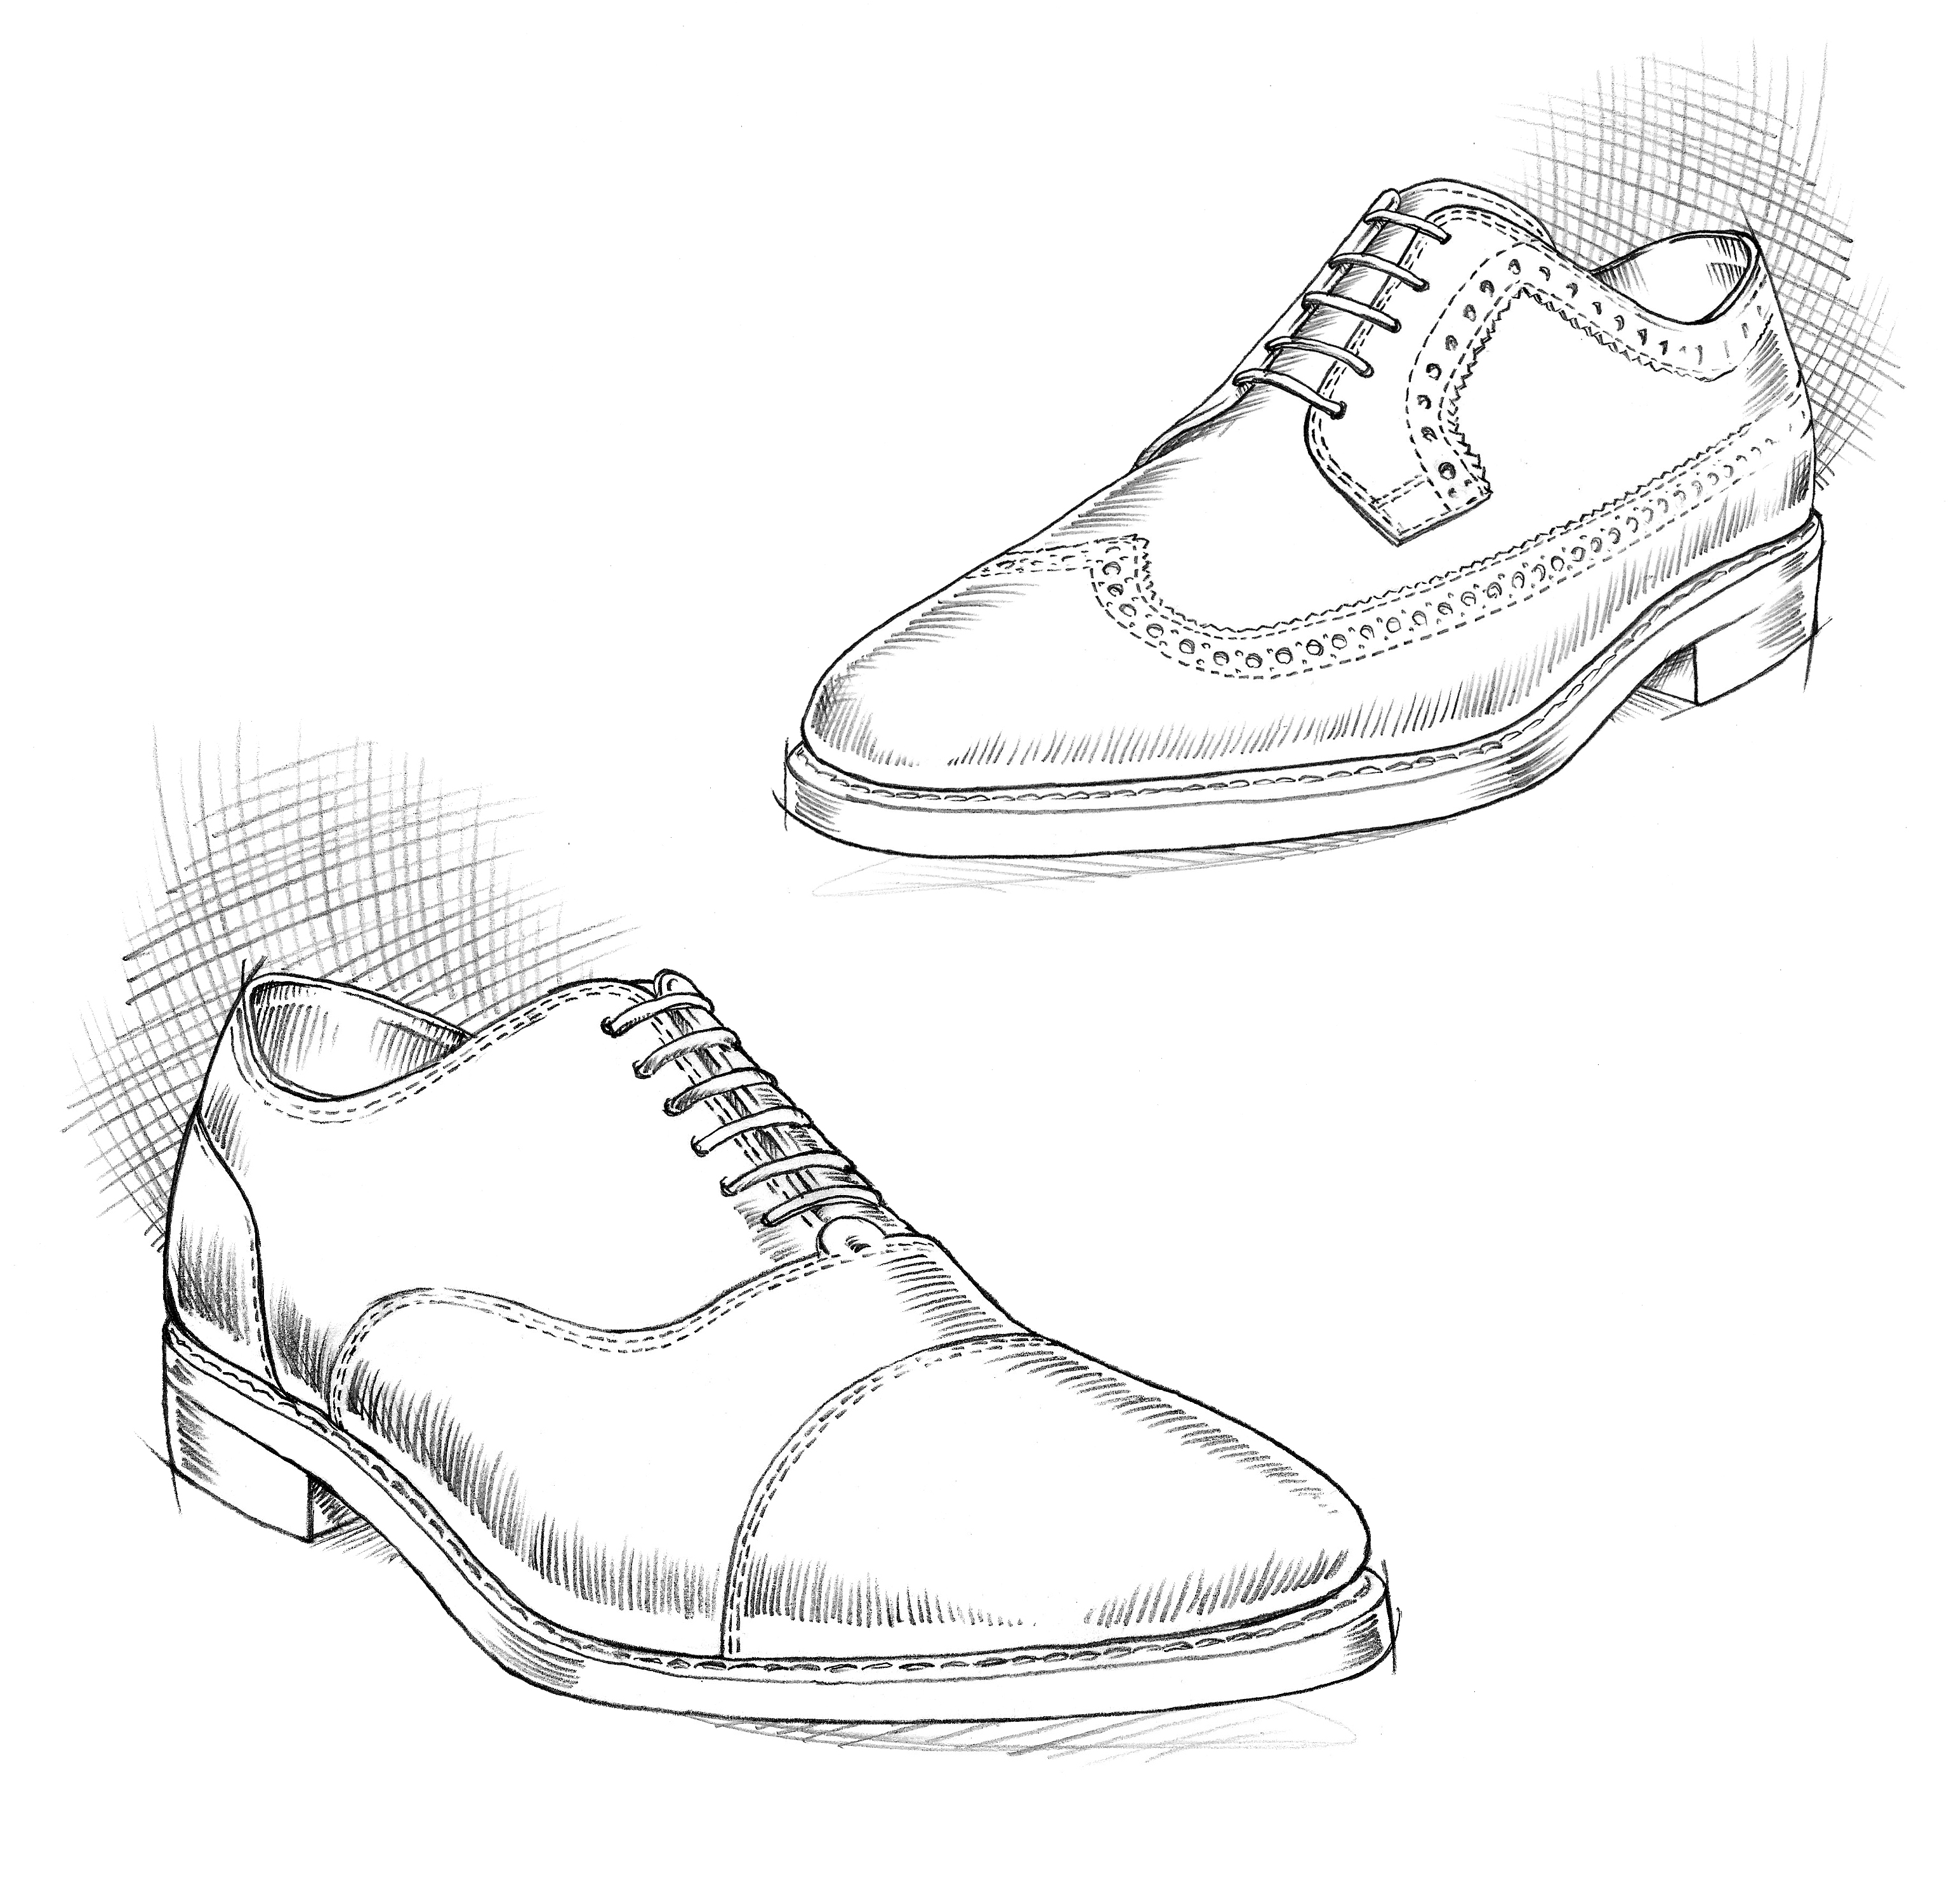 Caleres Shoe Sketches